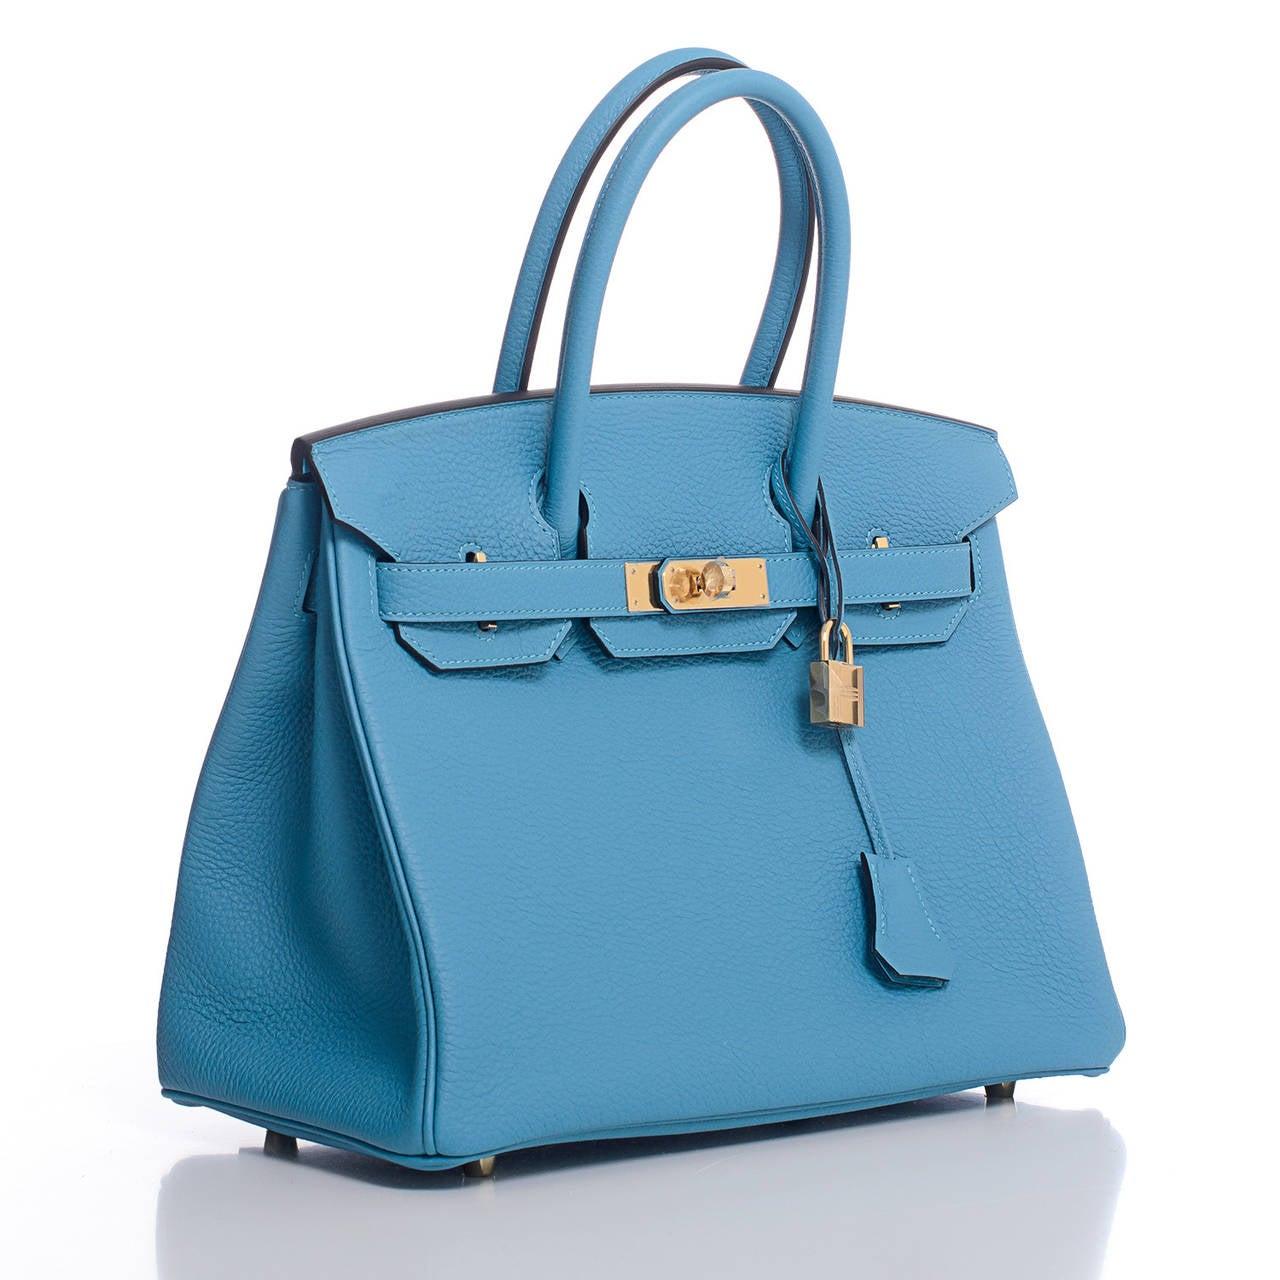 hermes replica bags - hermes birkin 30 togo turquoise gold hardware., hermes bucket bag